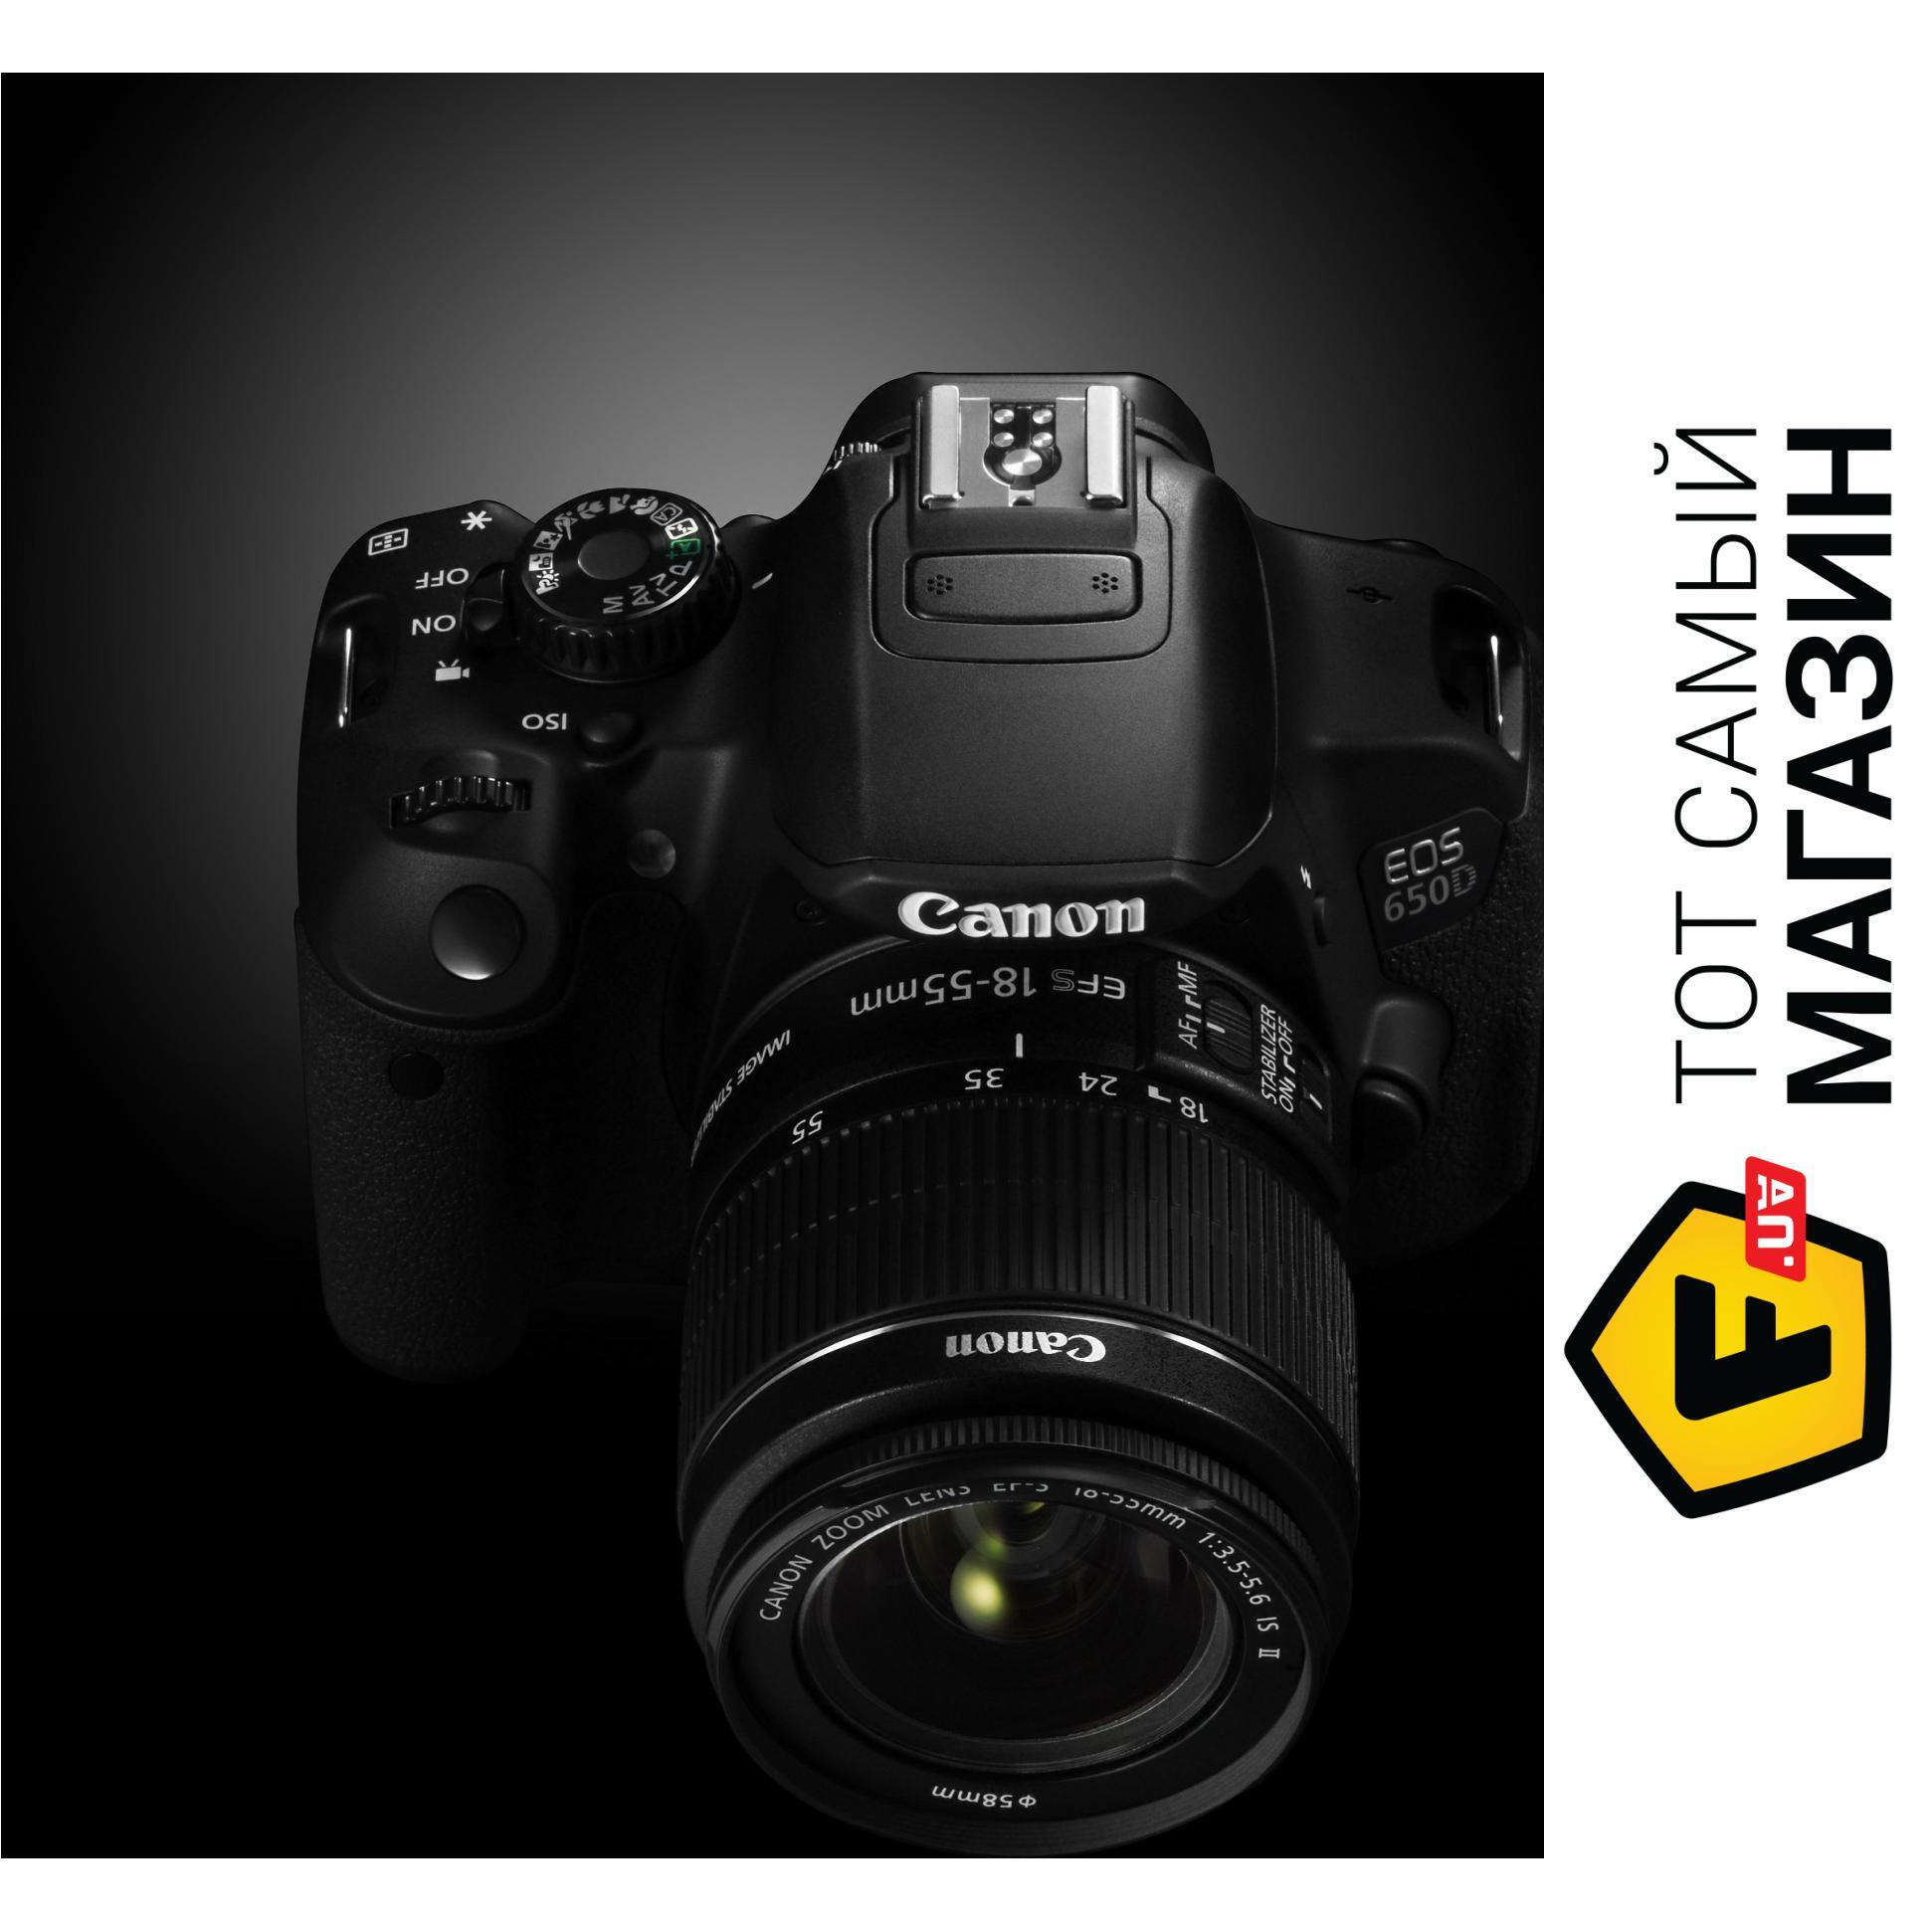 Canon EOS 650D 18-55mm IS II Kit